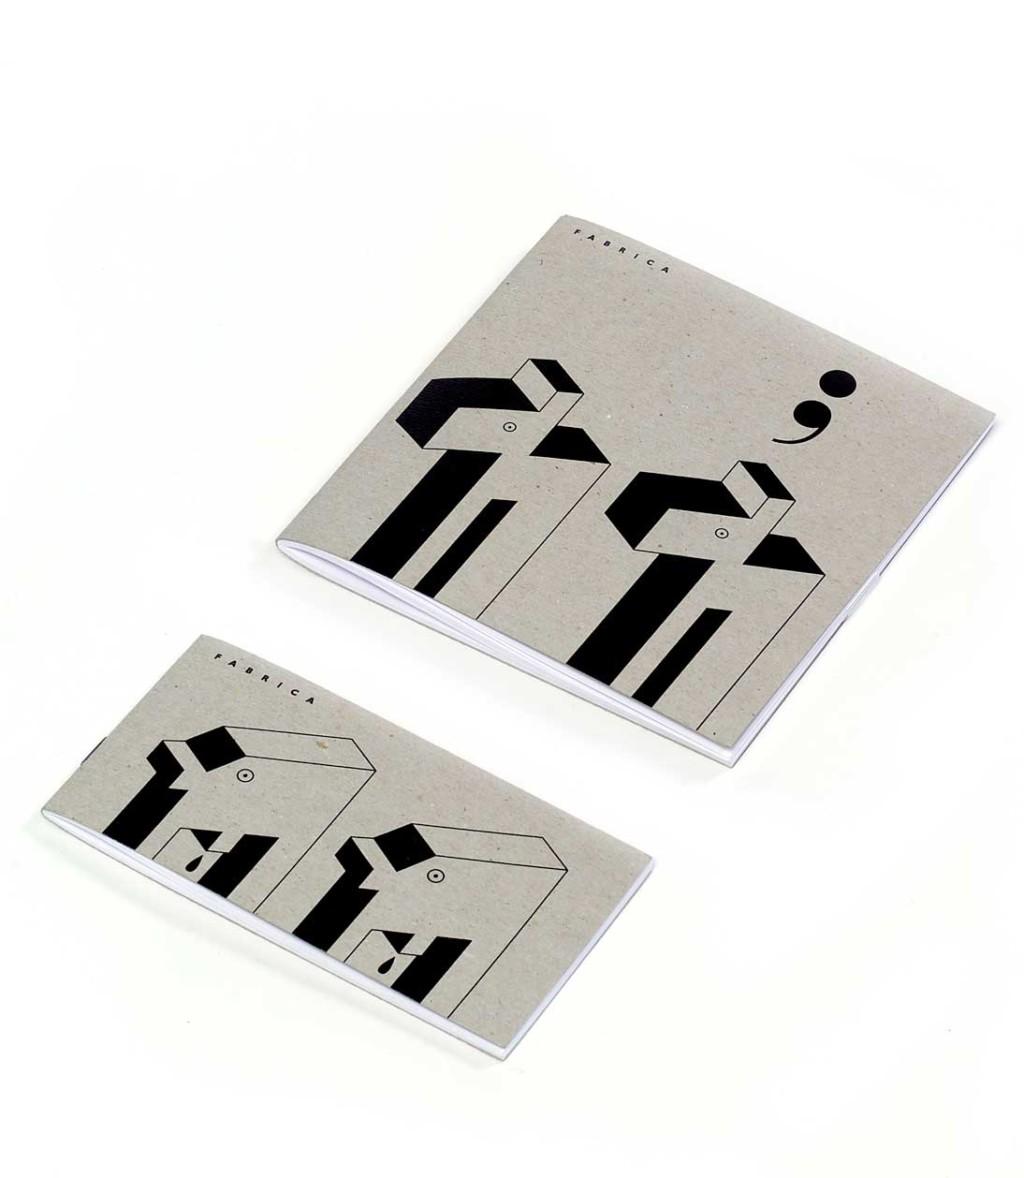 Isotype Isotype series